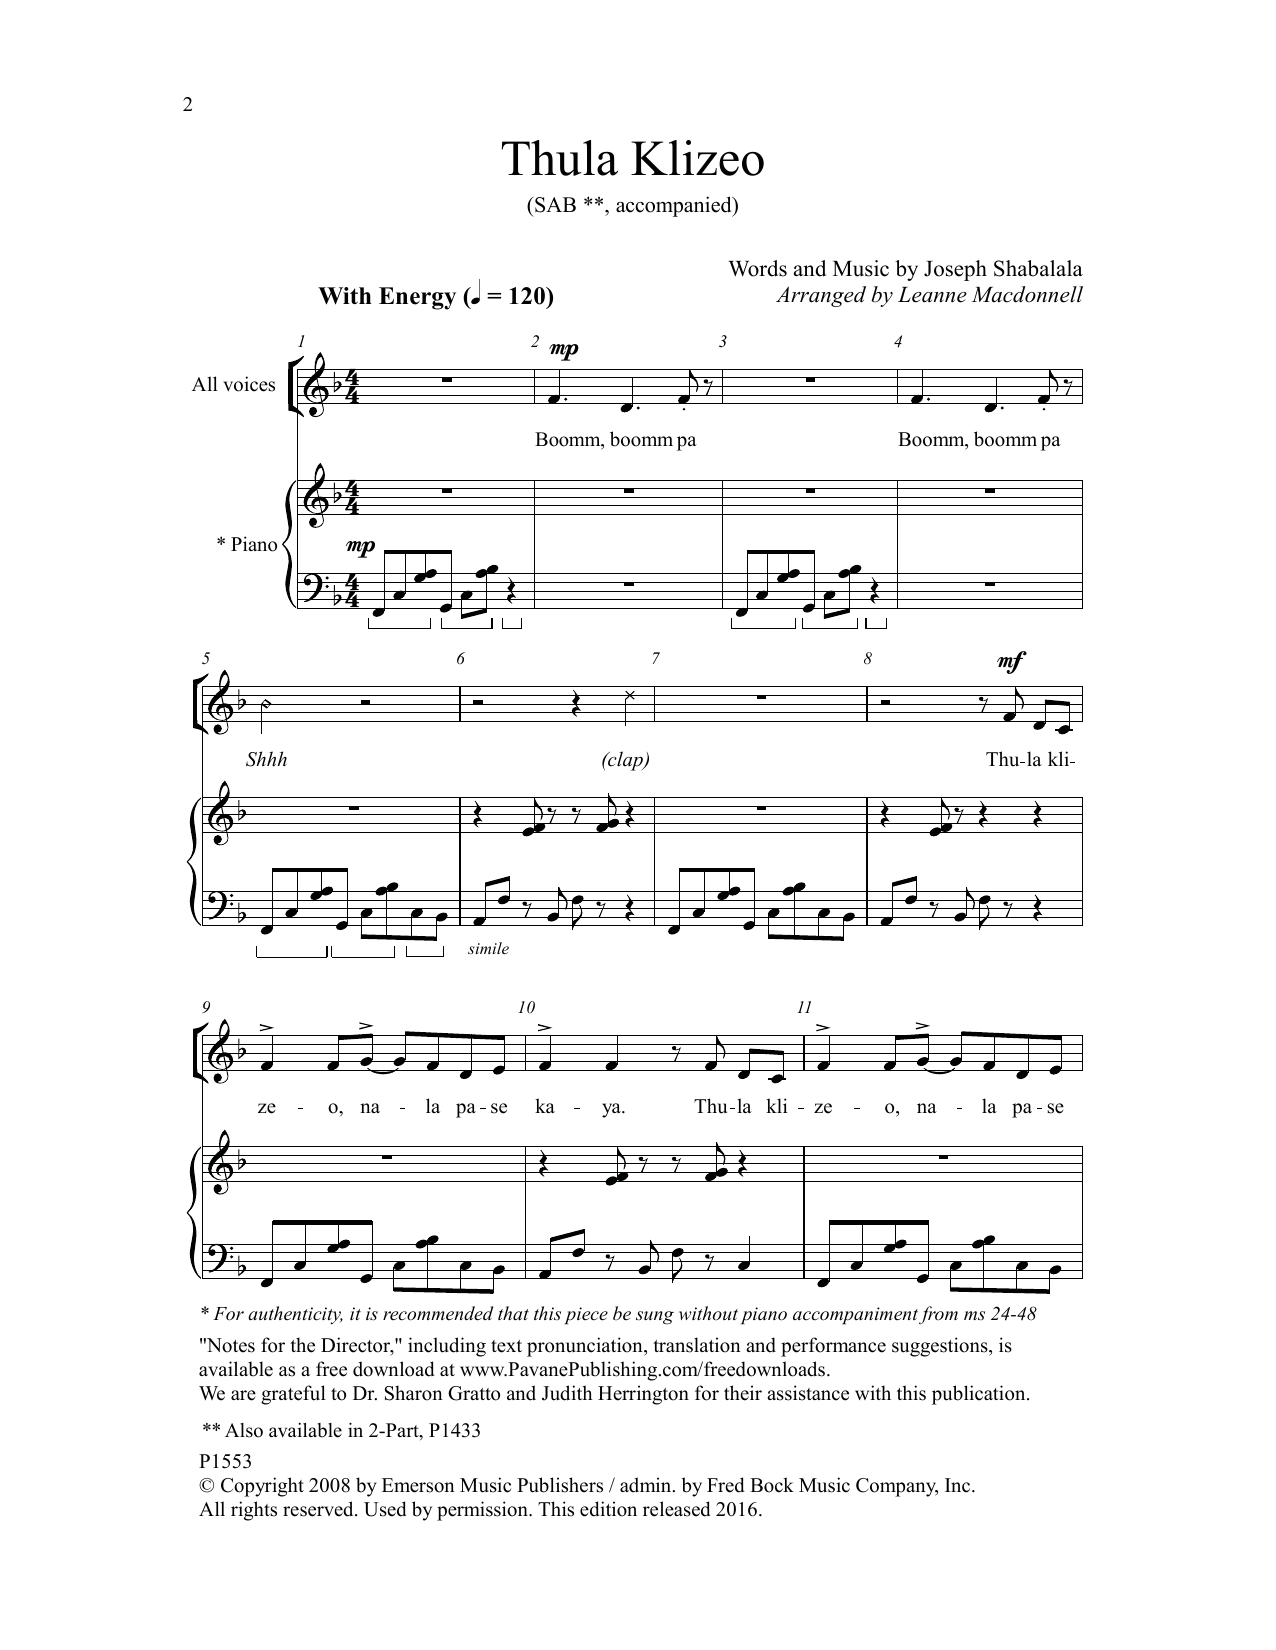 Thula Klizeo Sheet Music